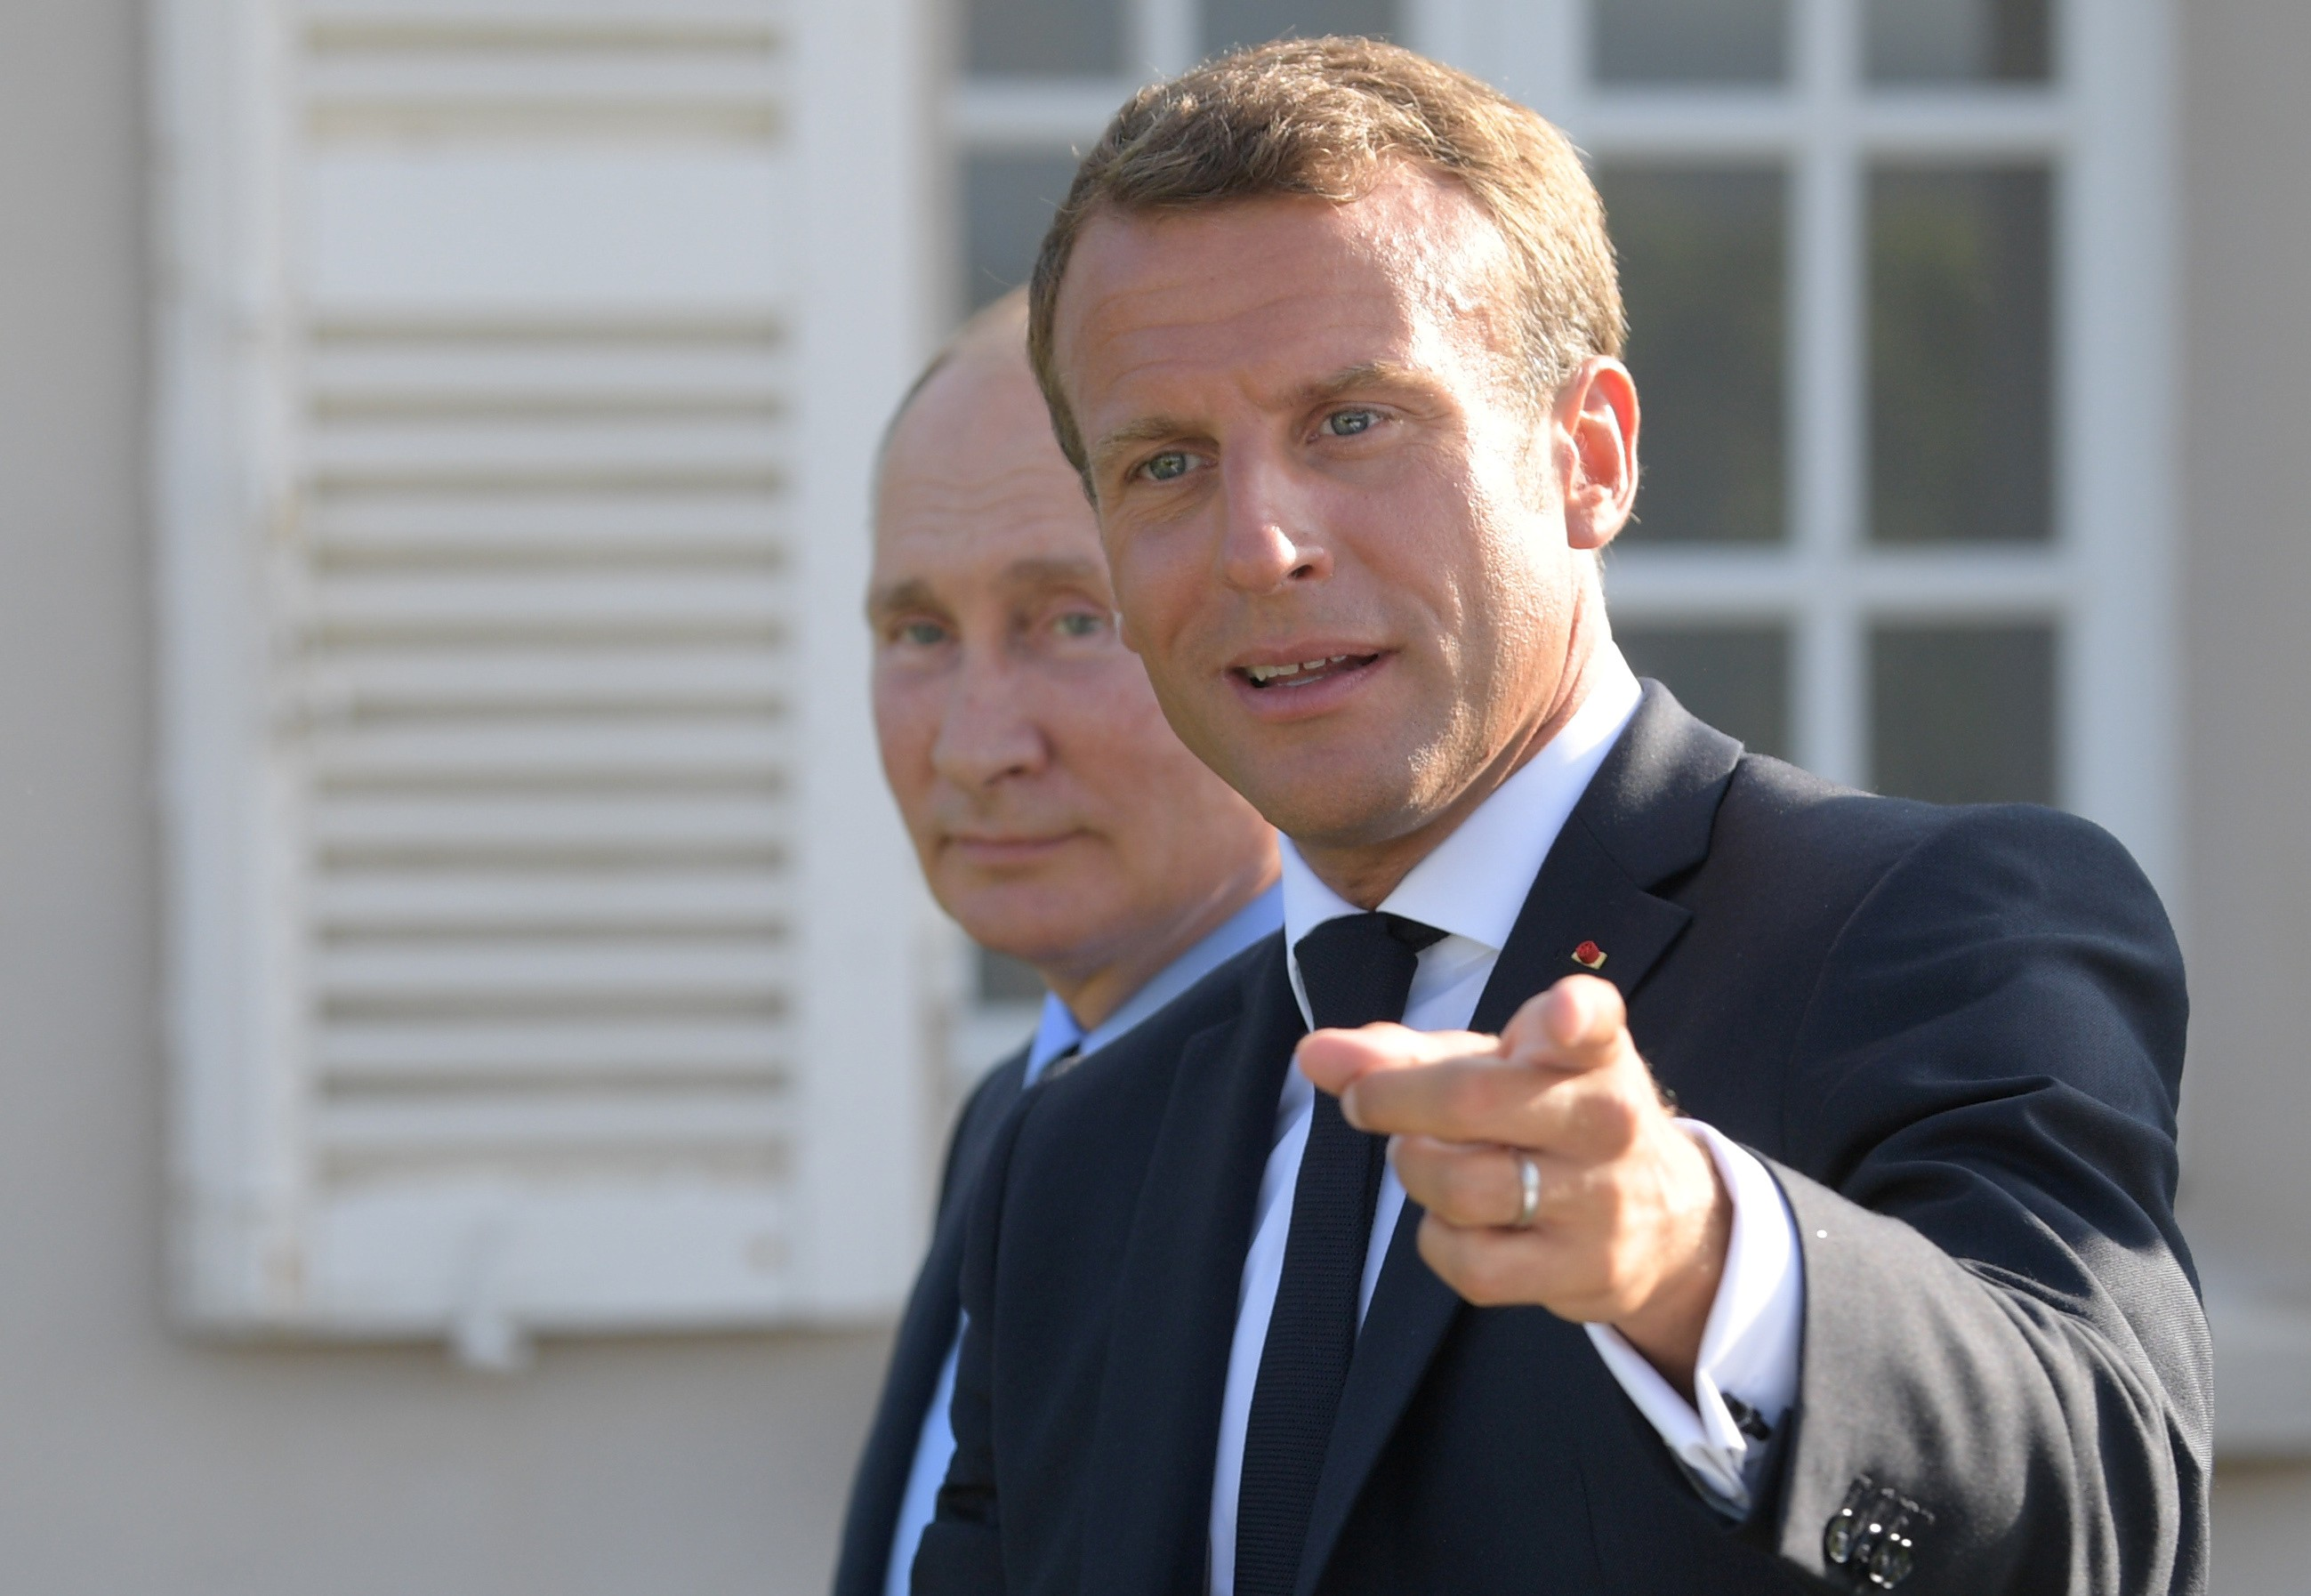 Vladimir Putin And Emmanuel Macron Optimistic On Ukraine But Clash Over Syria South China Morning Post